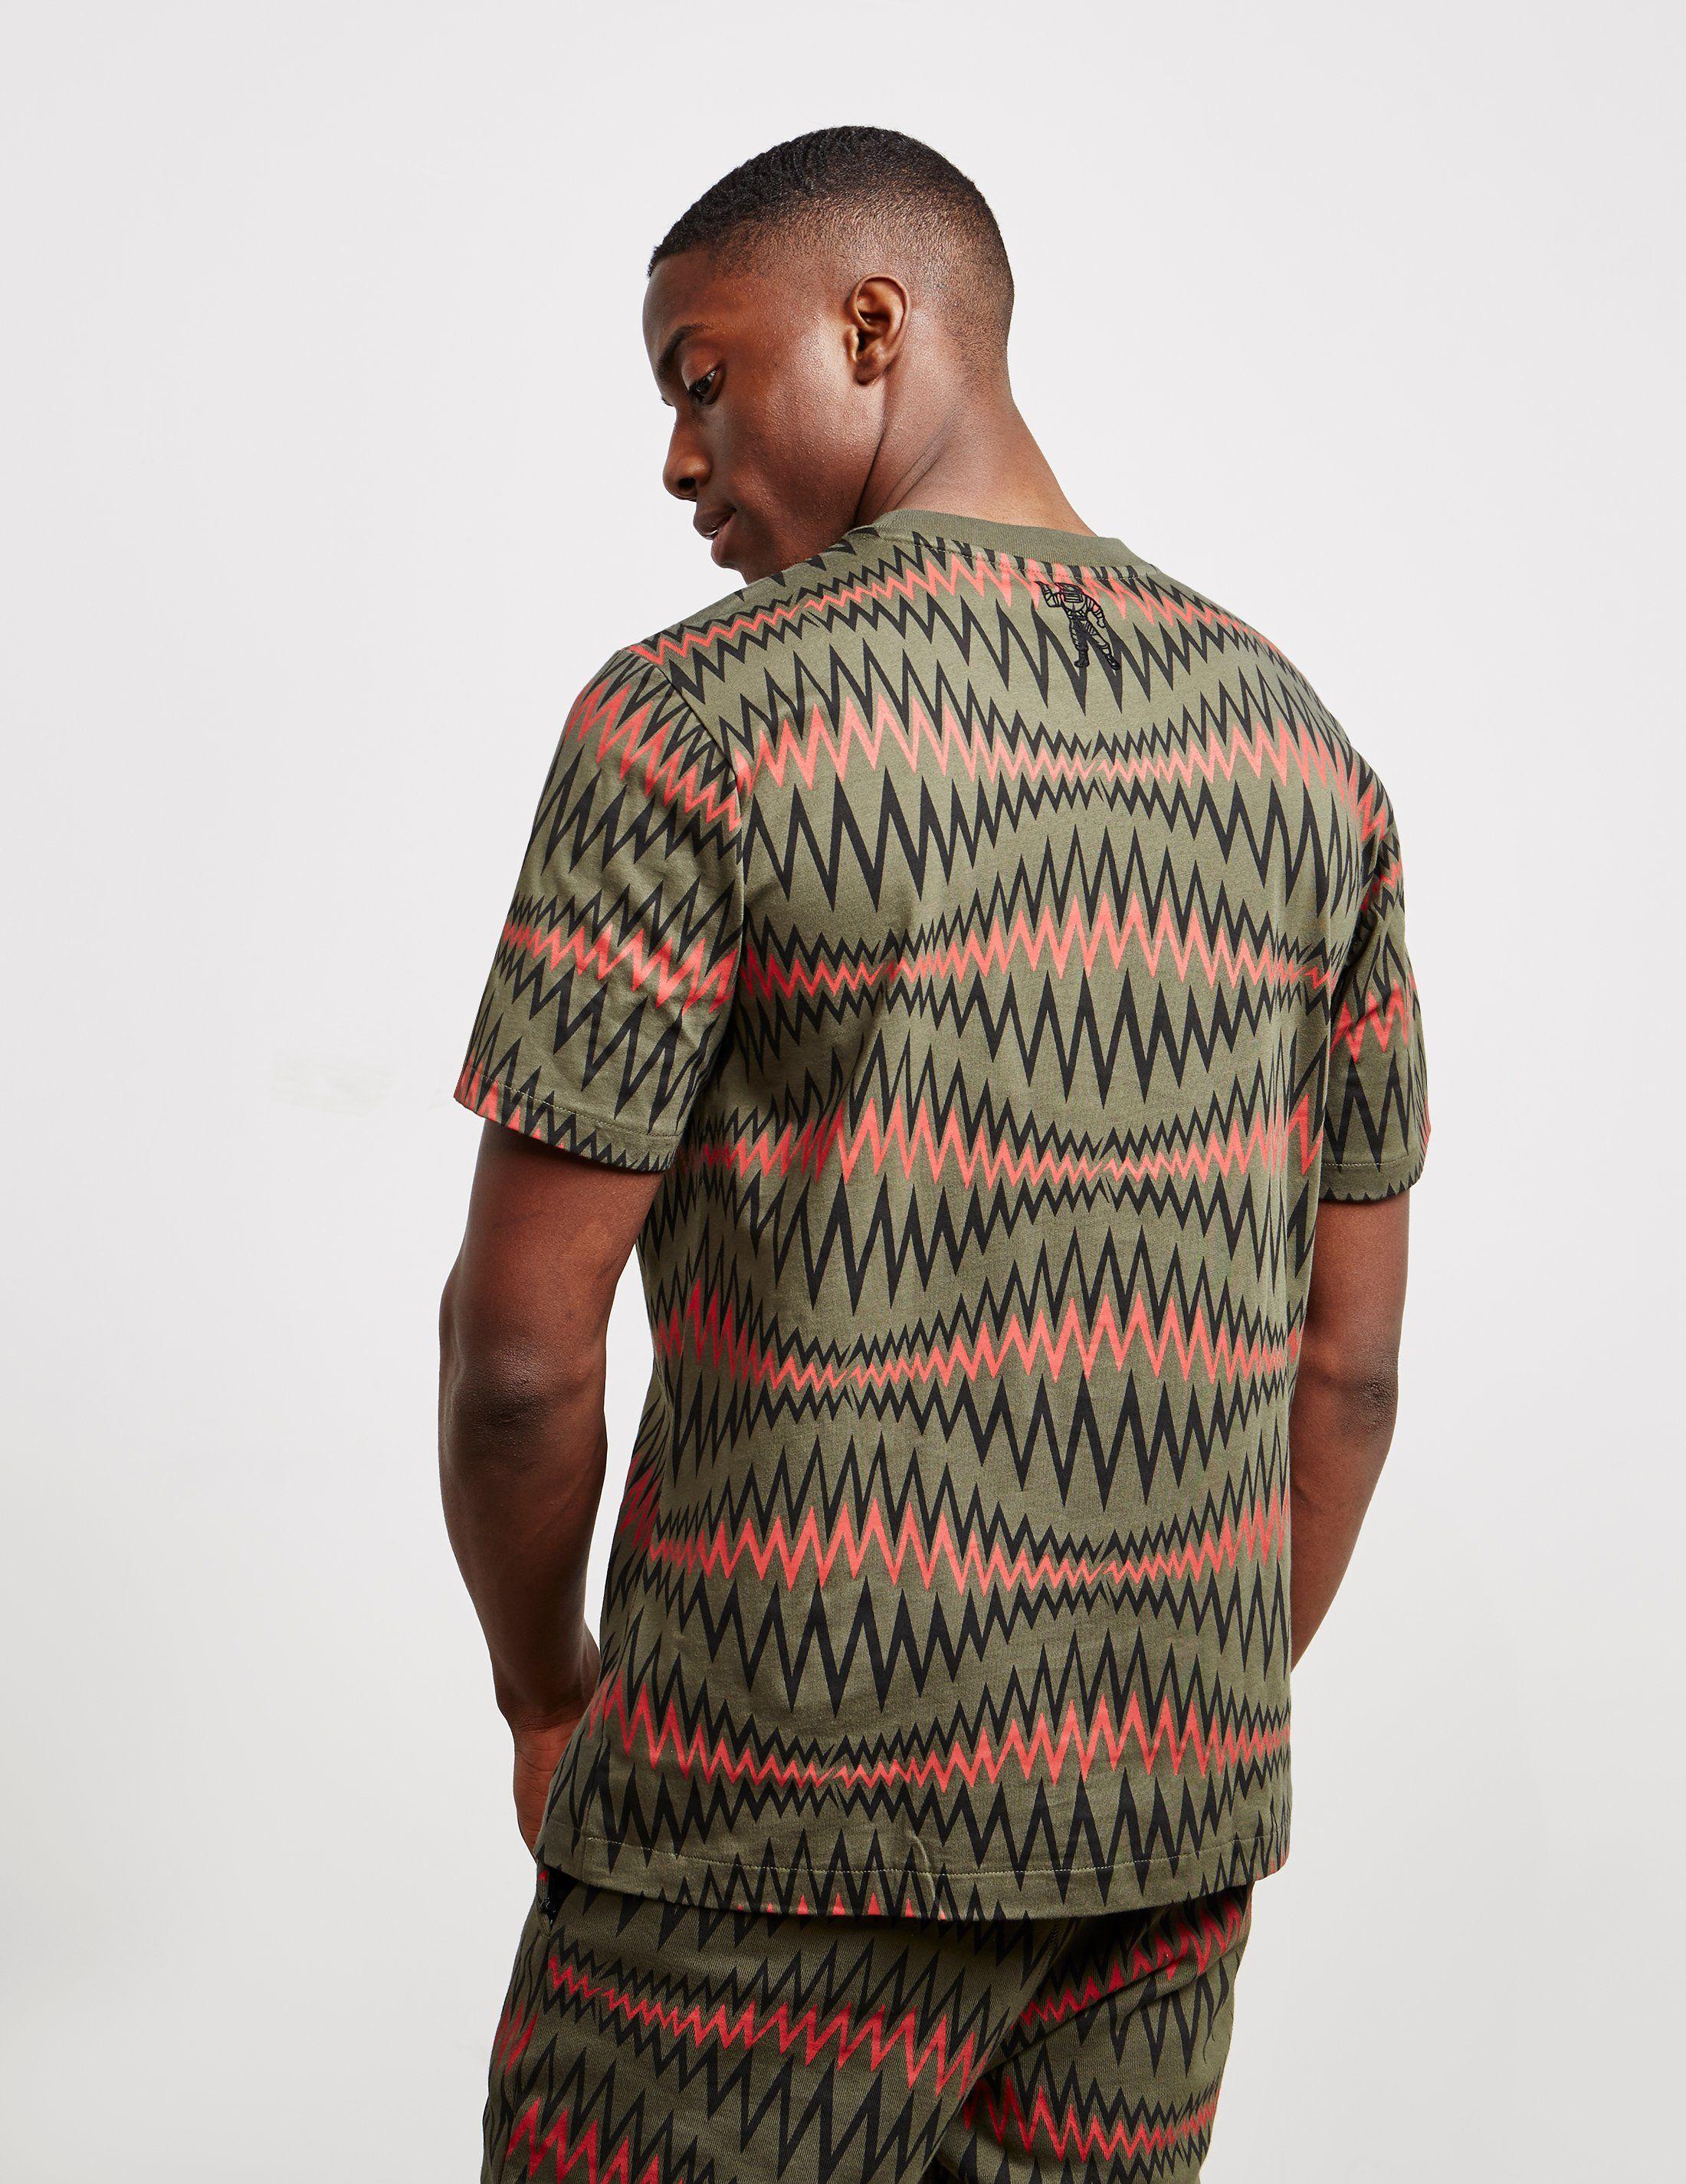 Billionaire Boys Club Sound Arc Short Sleeve T-Shirt